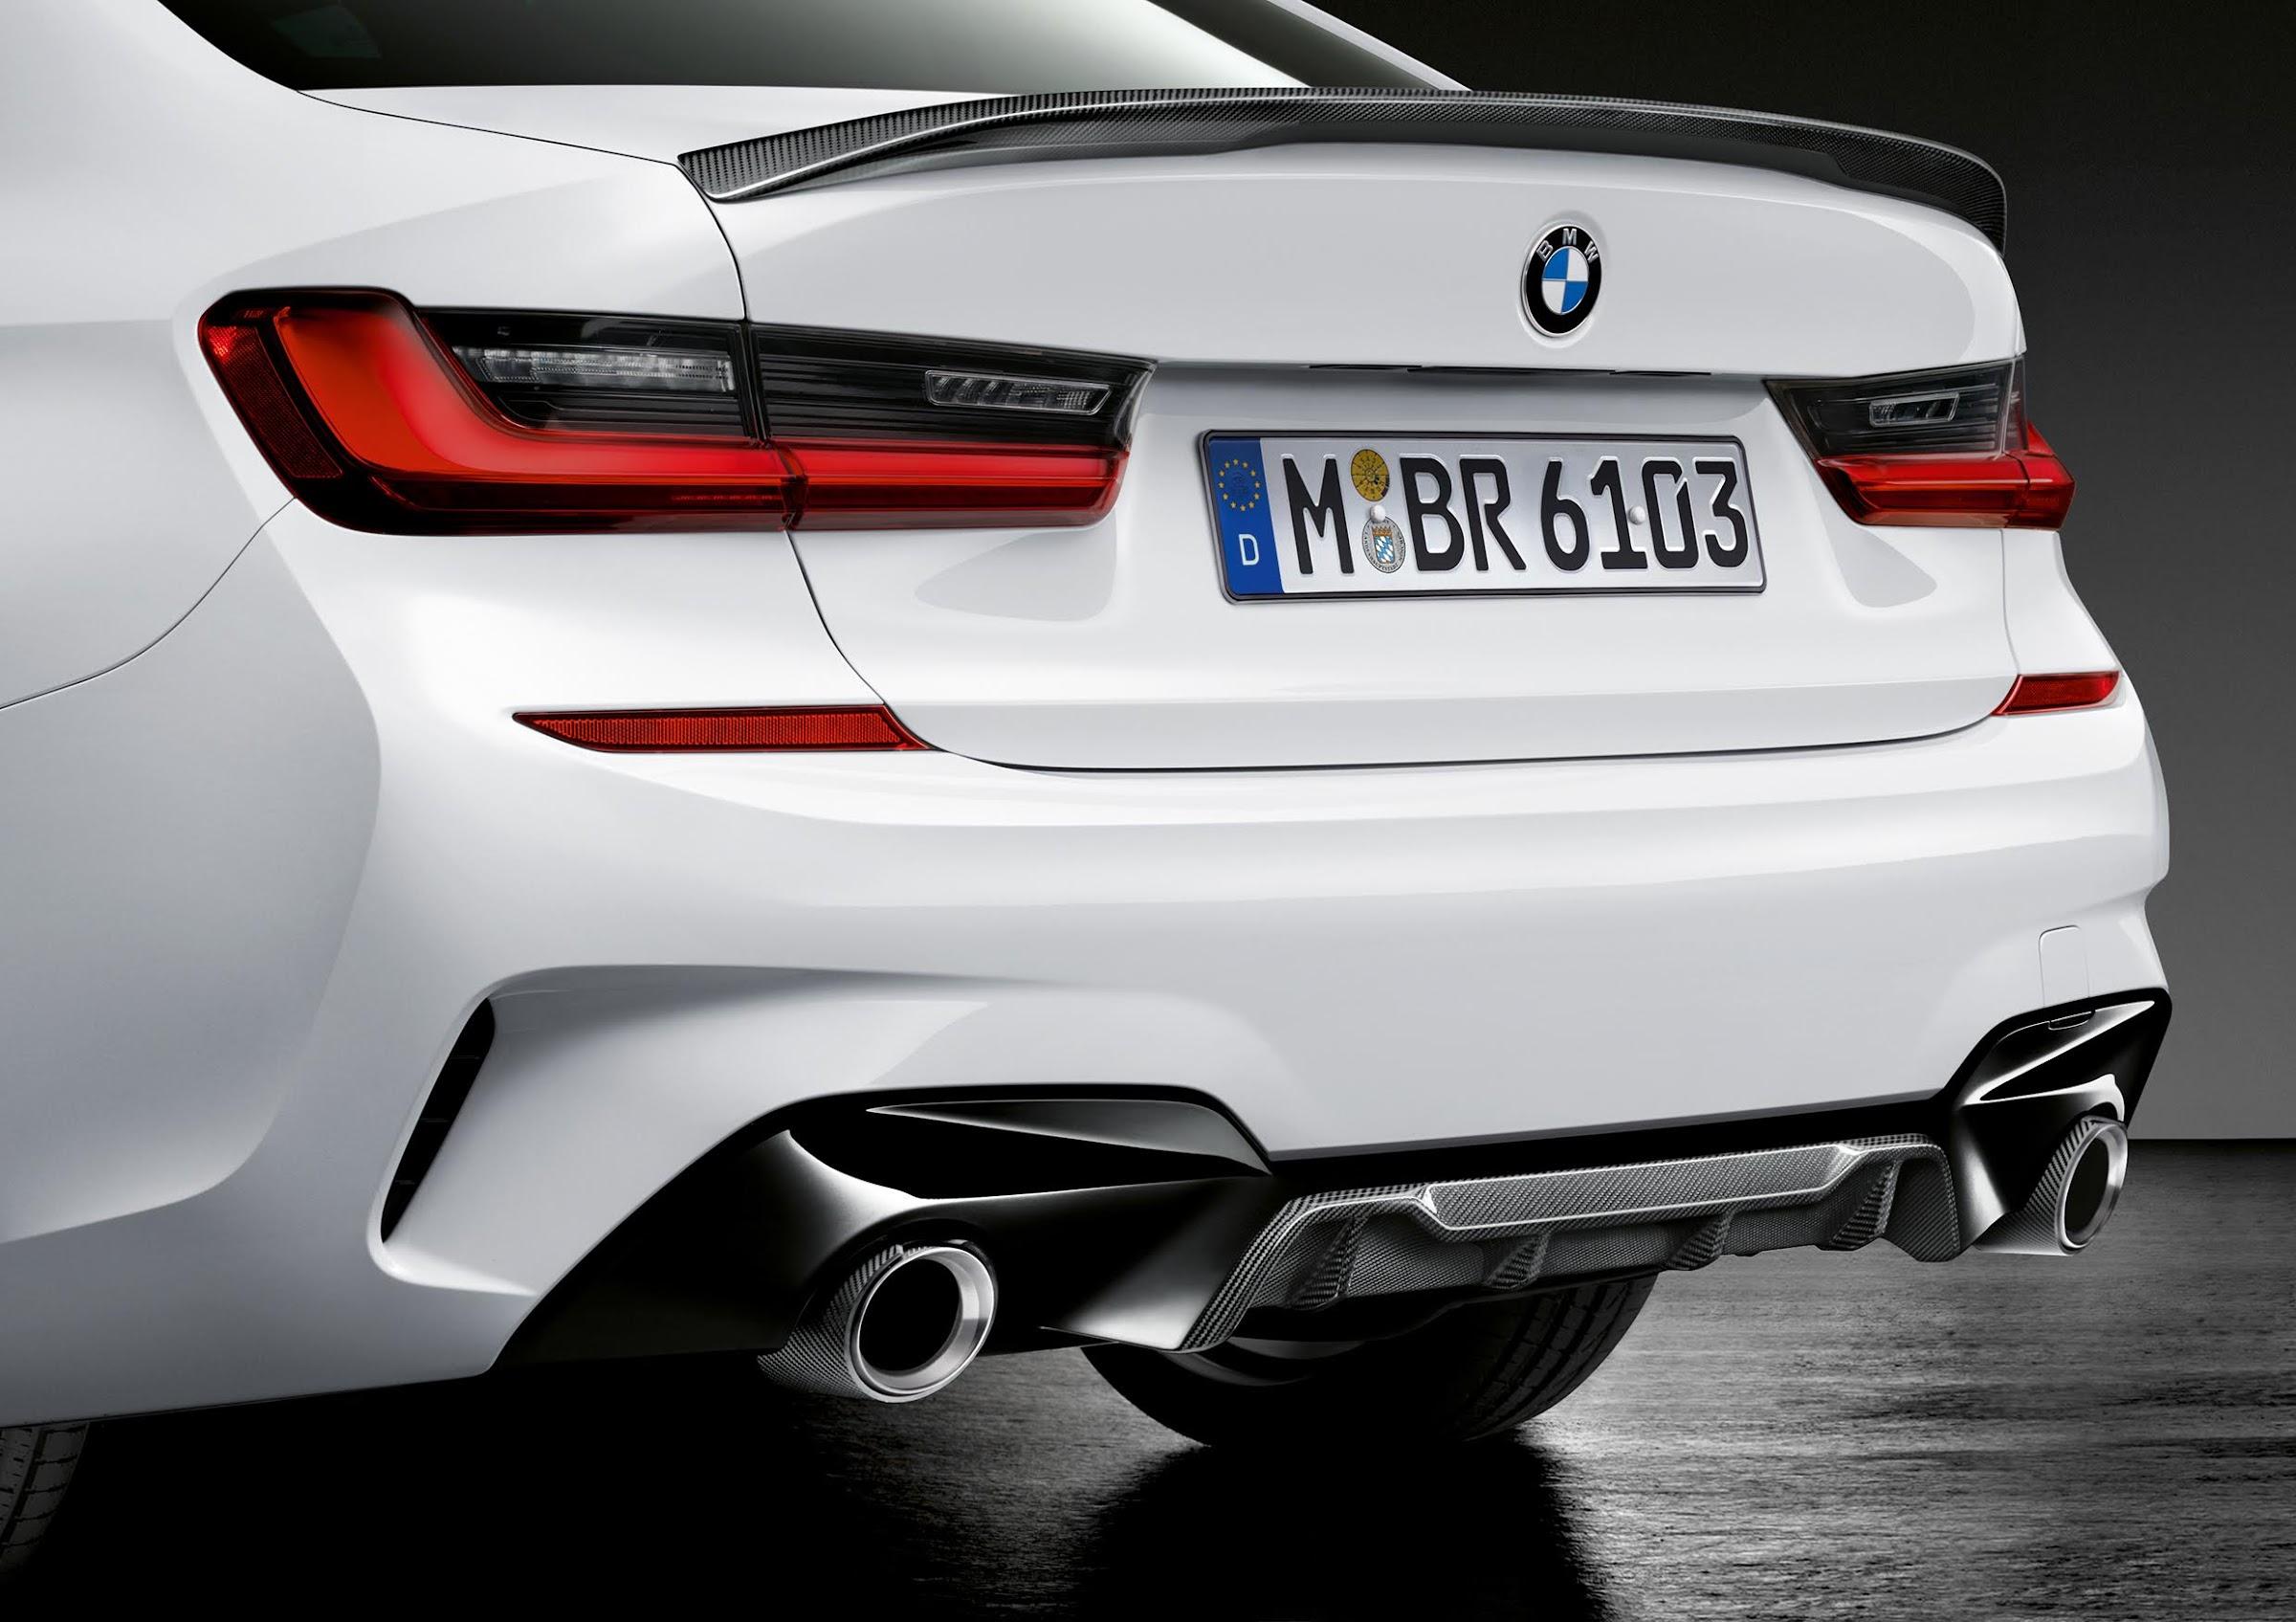 7eza olfW95HQubgzT9xHoVEMCpeGX5iEyV1JKqHydi5TInkYMIF7sRFRFLDgh5x70pmmfhmSu zYebfBi 5p HQwpaHN7h19Ys7nvpWqdoUH5n8Vl1Vu2hnvgzwCrL79j35ydhQ=w2400 - Accesorios M Performance para el nuevo BMW Serie 3